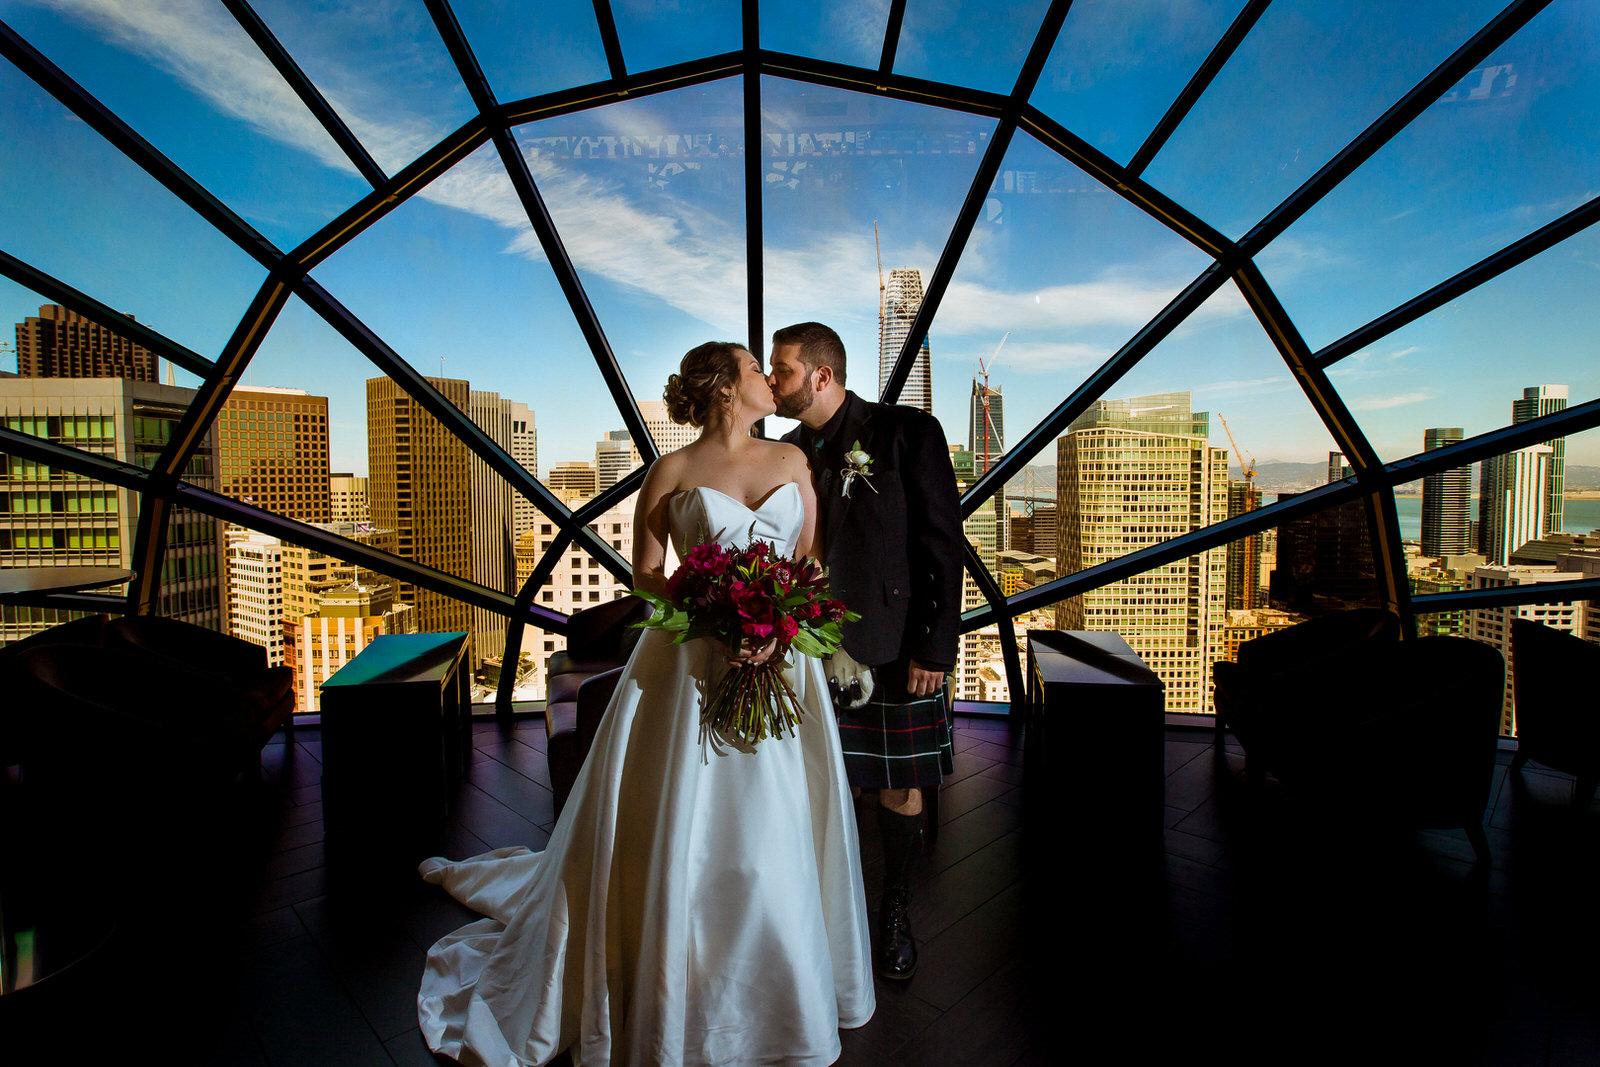 san-francisco-marriott-marquis-wedding-steph-lynn-photo-23.jpg